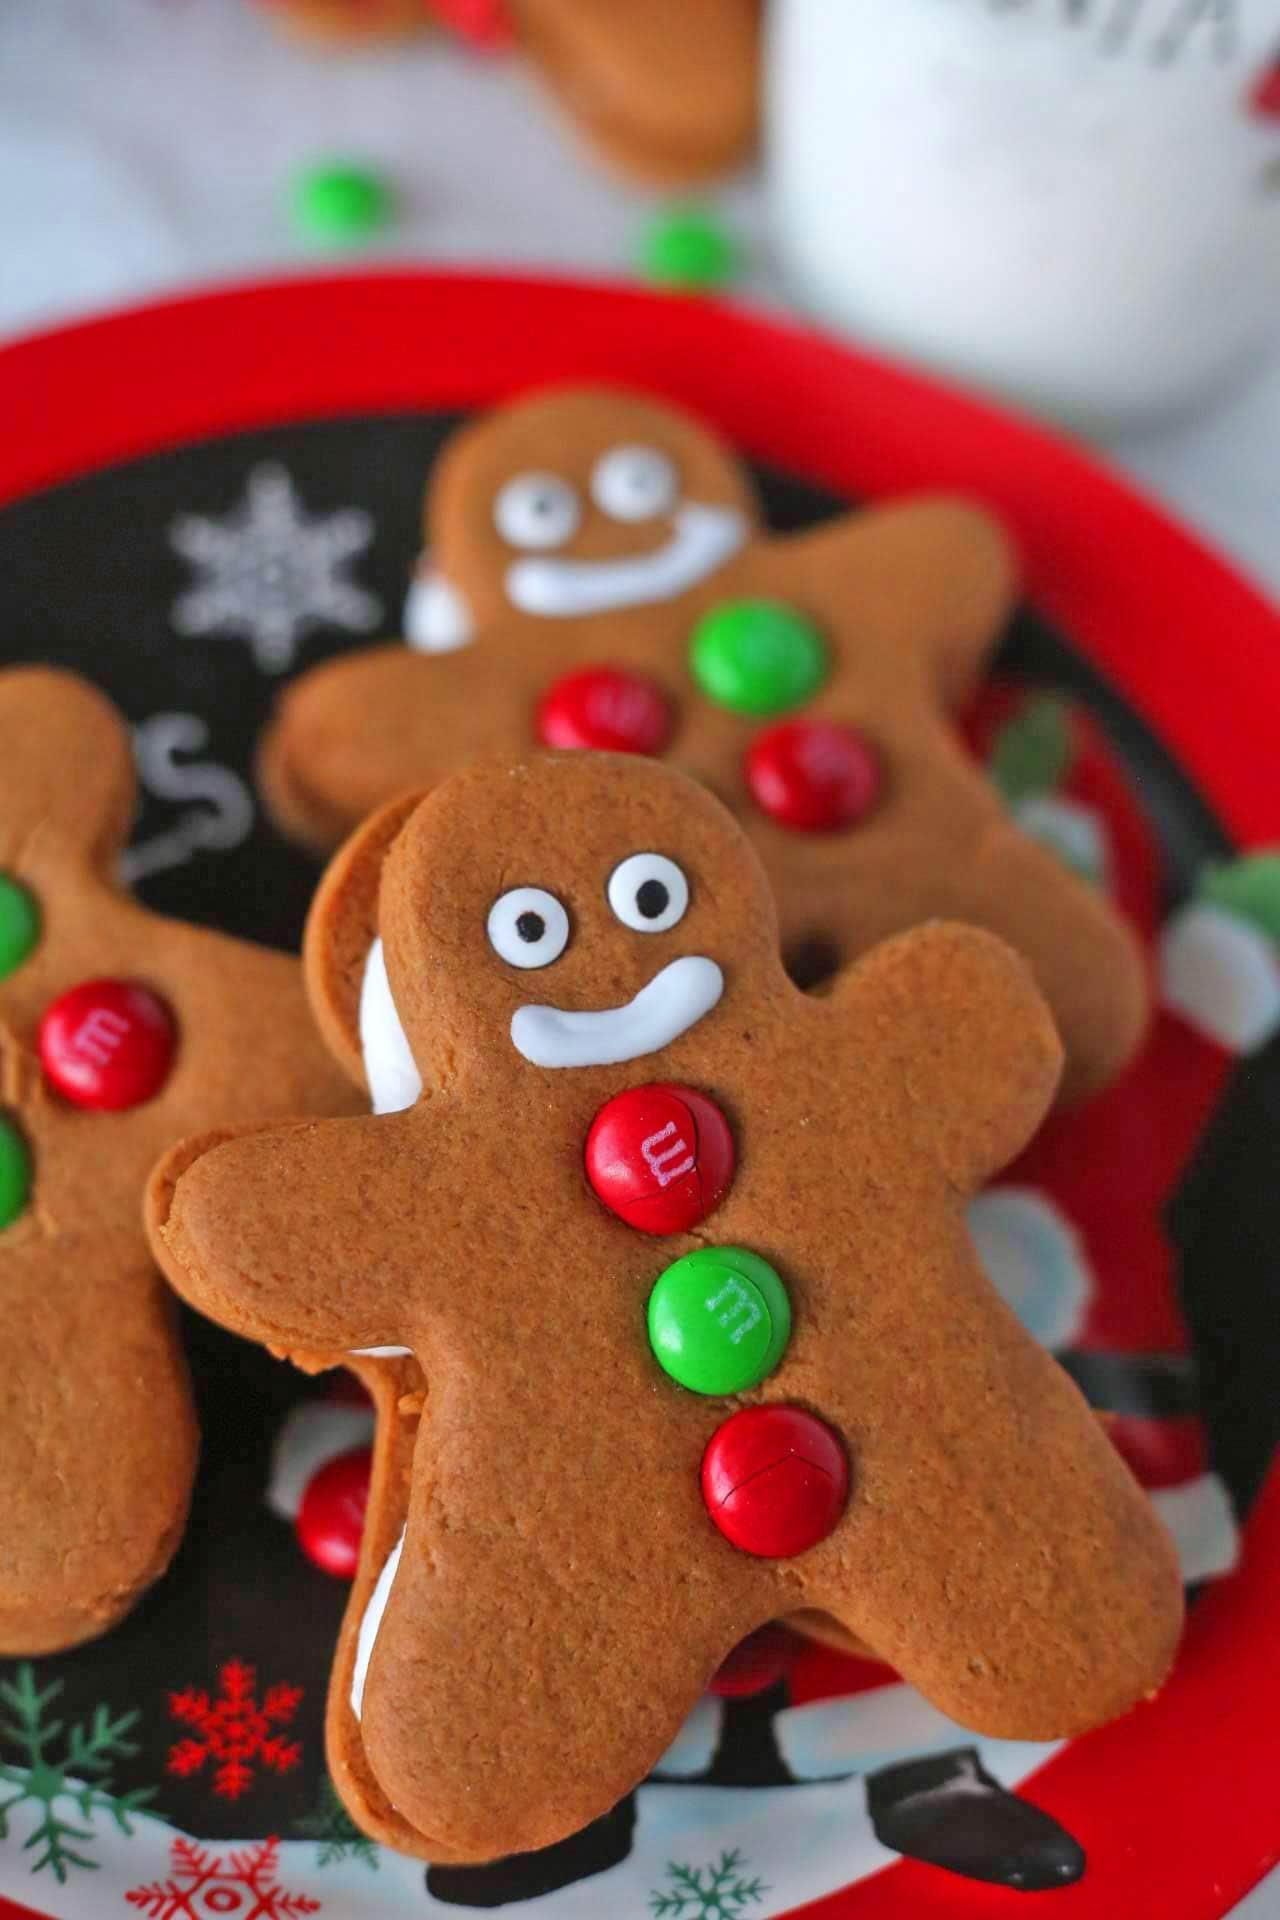 3D Standing Gingerbread Men Sugar Cookies - In the Kids